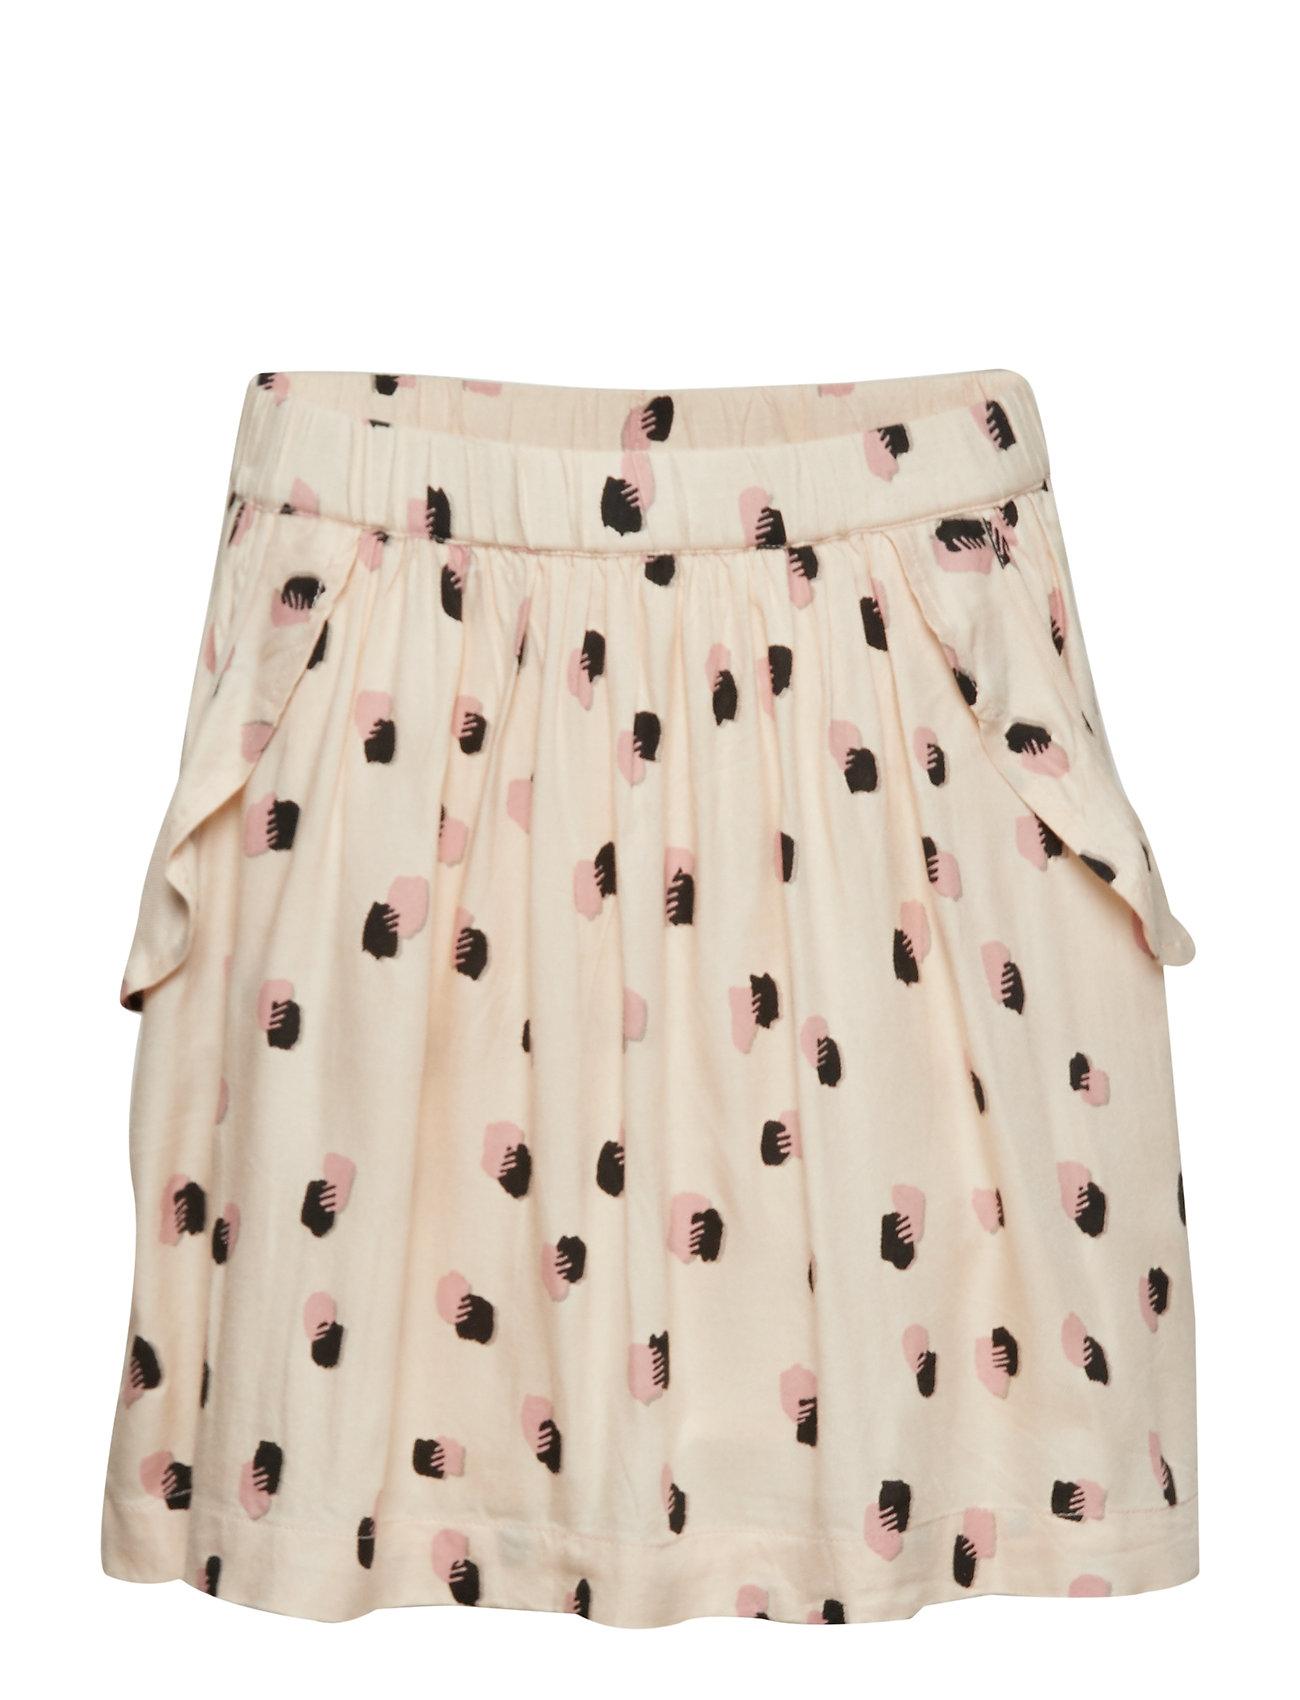 d19cff5b256 Skirt (Alesan) (195 kr) - Noa Noa Miniature - | Boozt.com